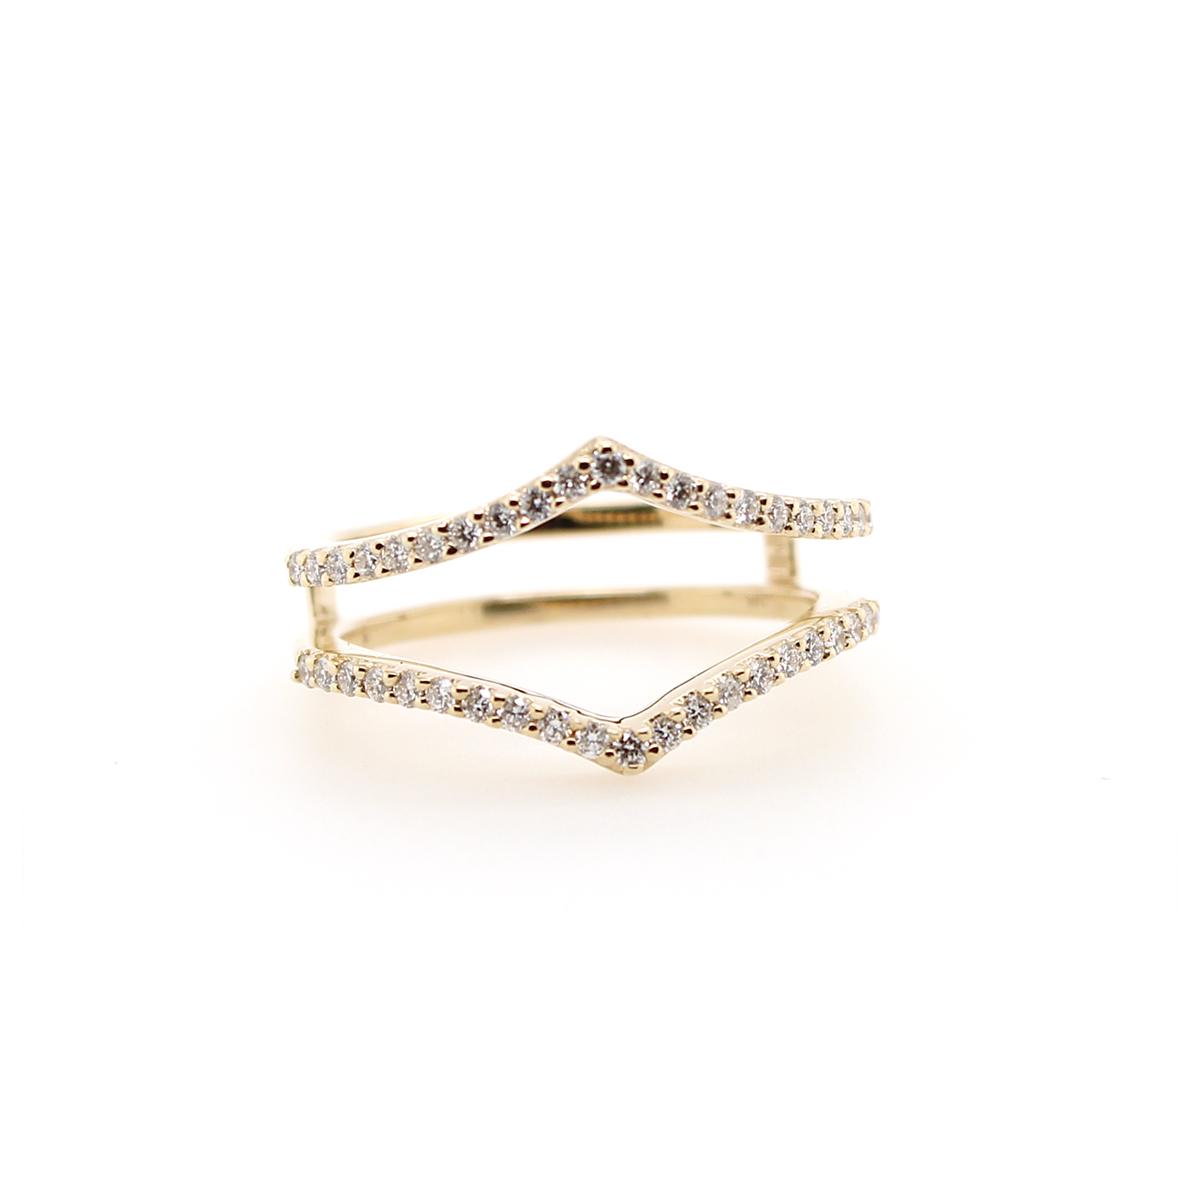 Shefi Diamonds 14 Karat Yellow Gold .33 Carat Diamond Sharp Curve Ring Jacket